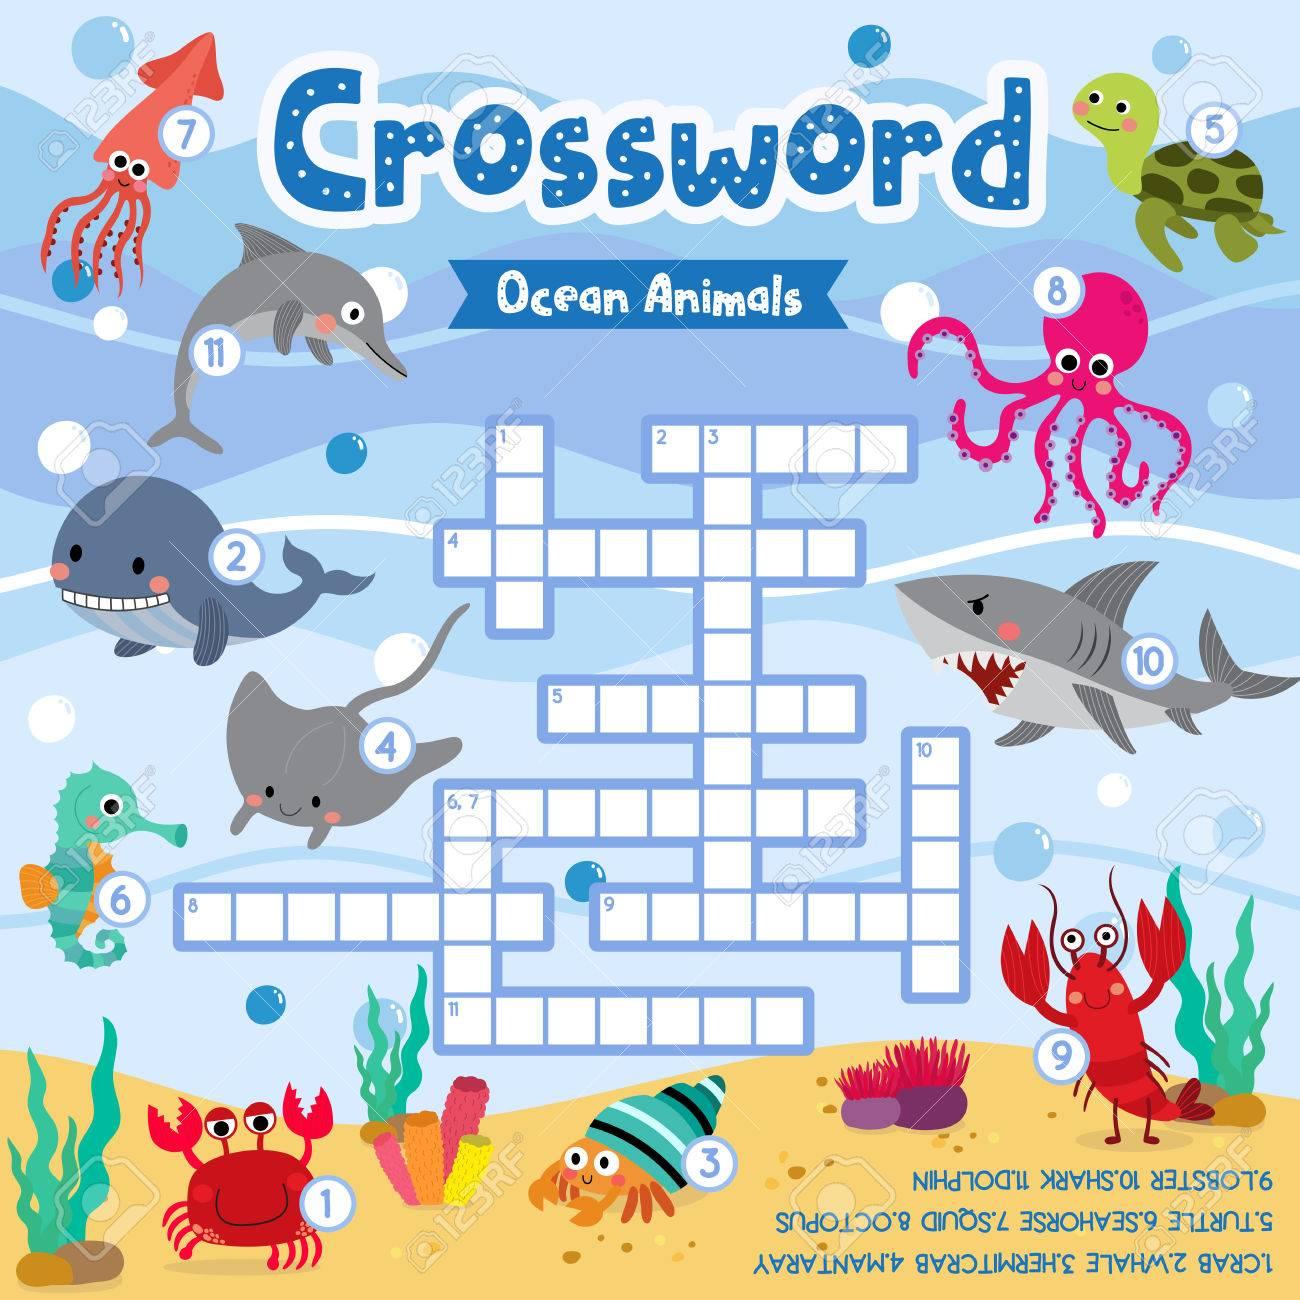 photo relating to Ocean Animals Printable named Crosswords puzzle recreation of ocean pets for preschool children match..